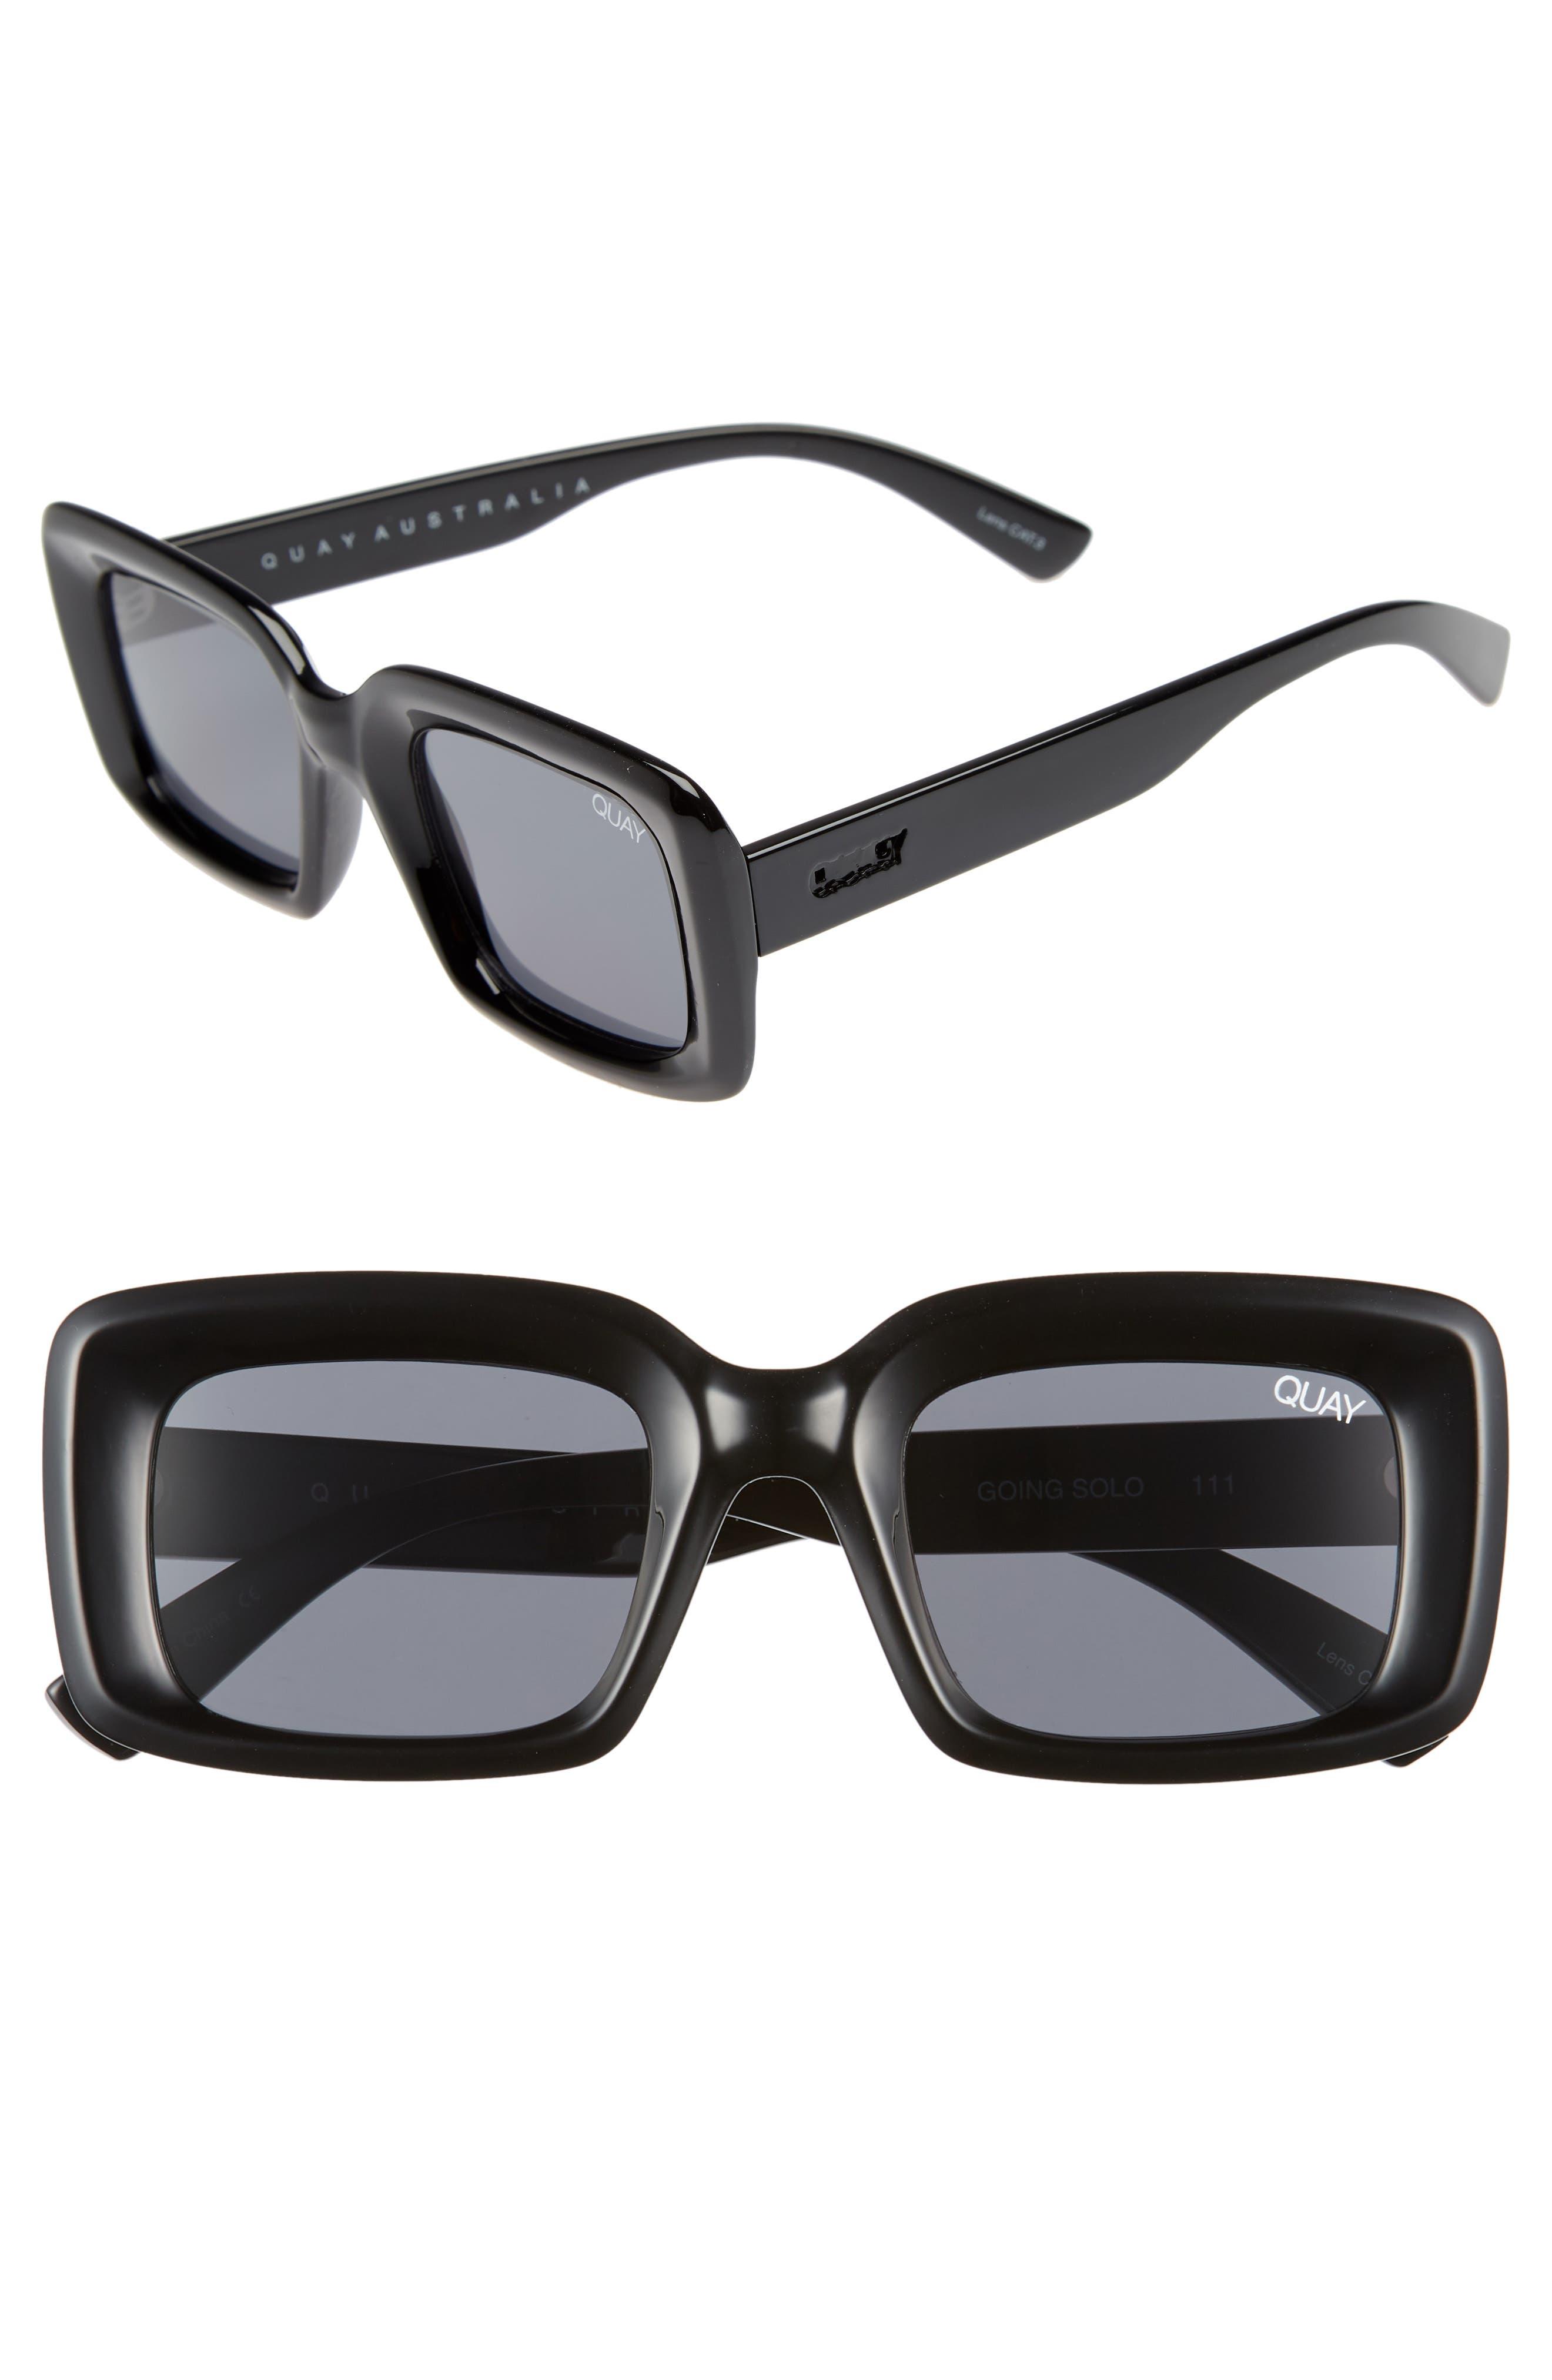 Quay Australia Going Solo 4m Square Sunglasses - Black/ Smoke